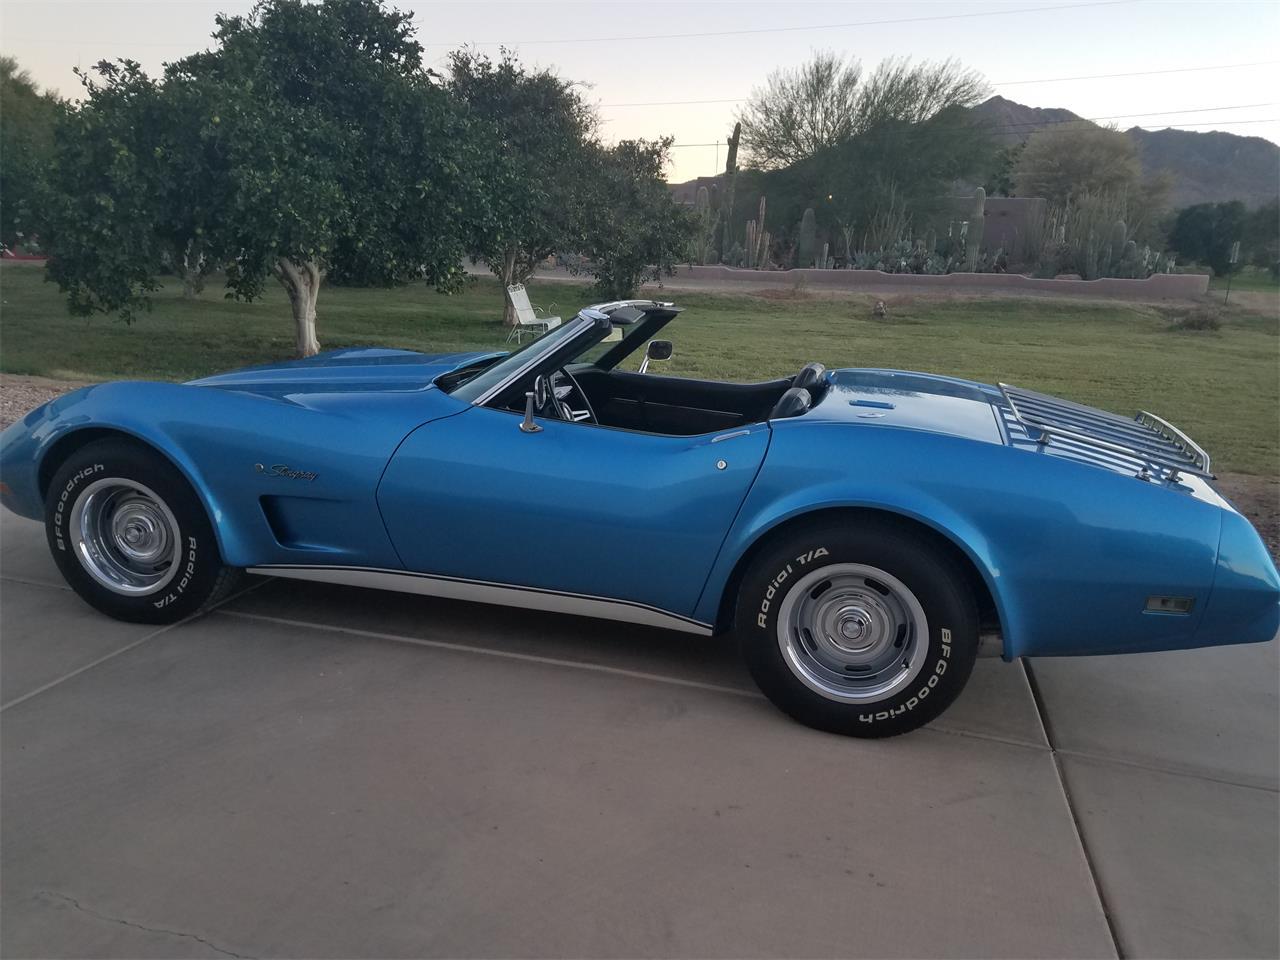 1975 Chevrolet Corvette (CC-1224189) for sale in Queen Creek, Arizona